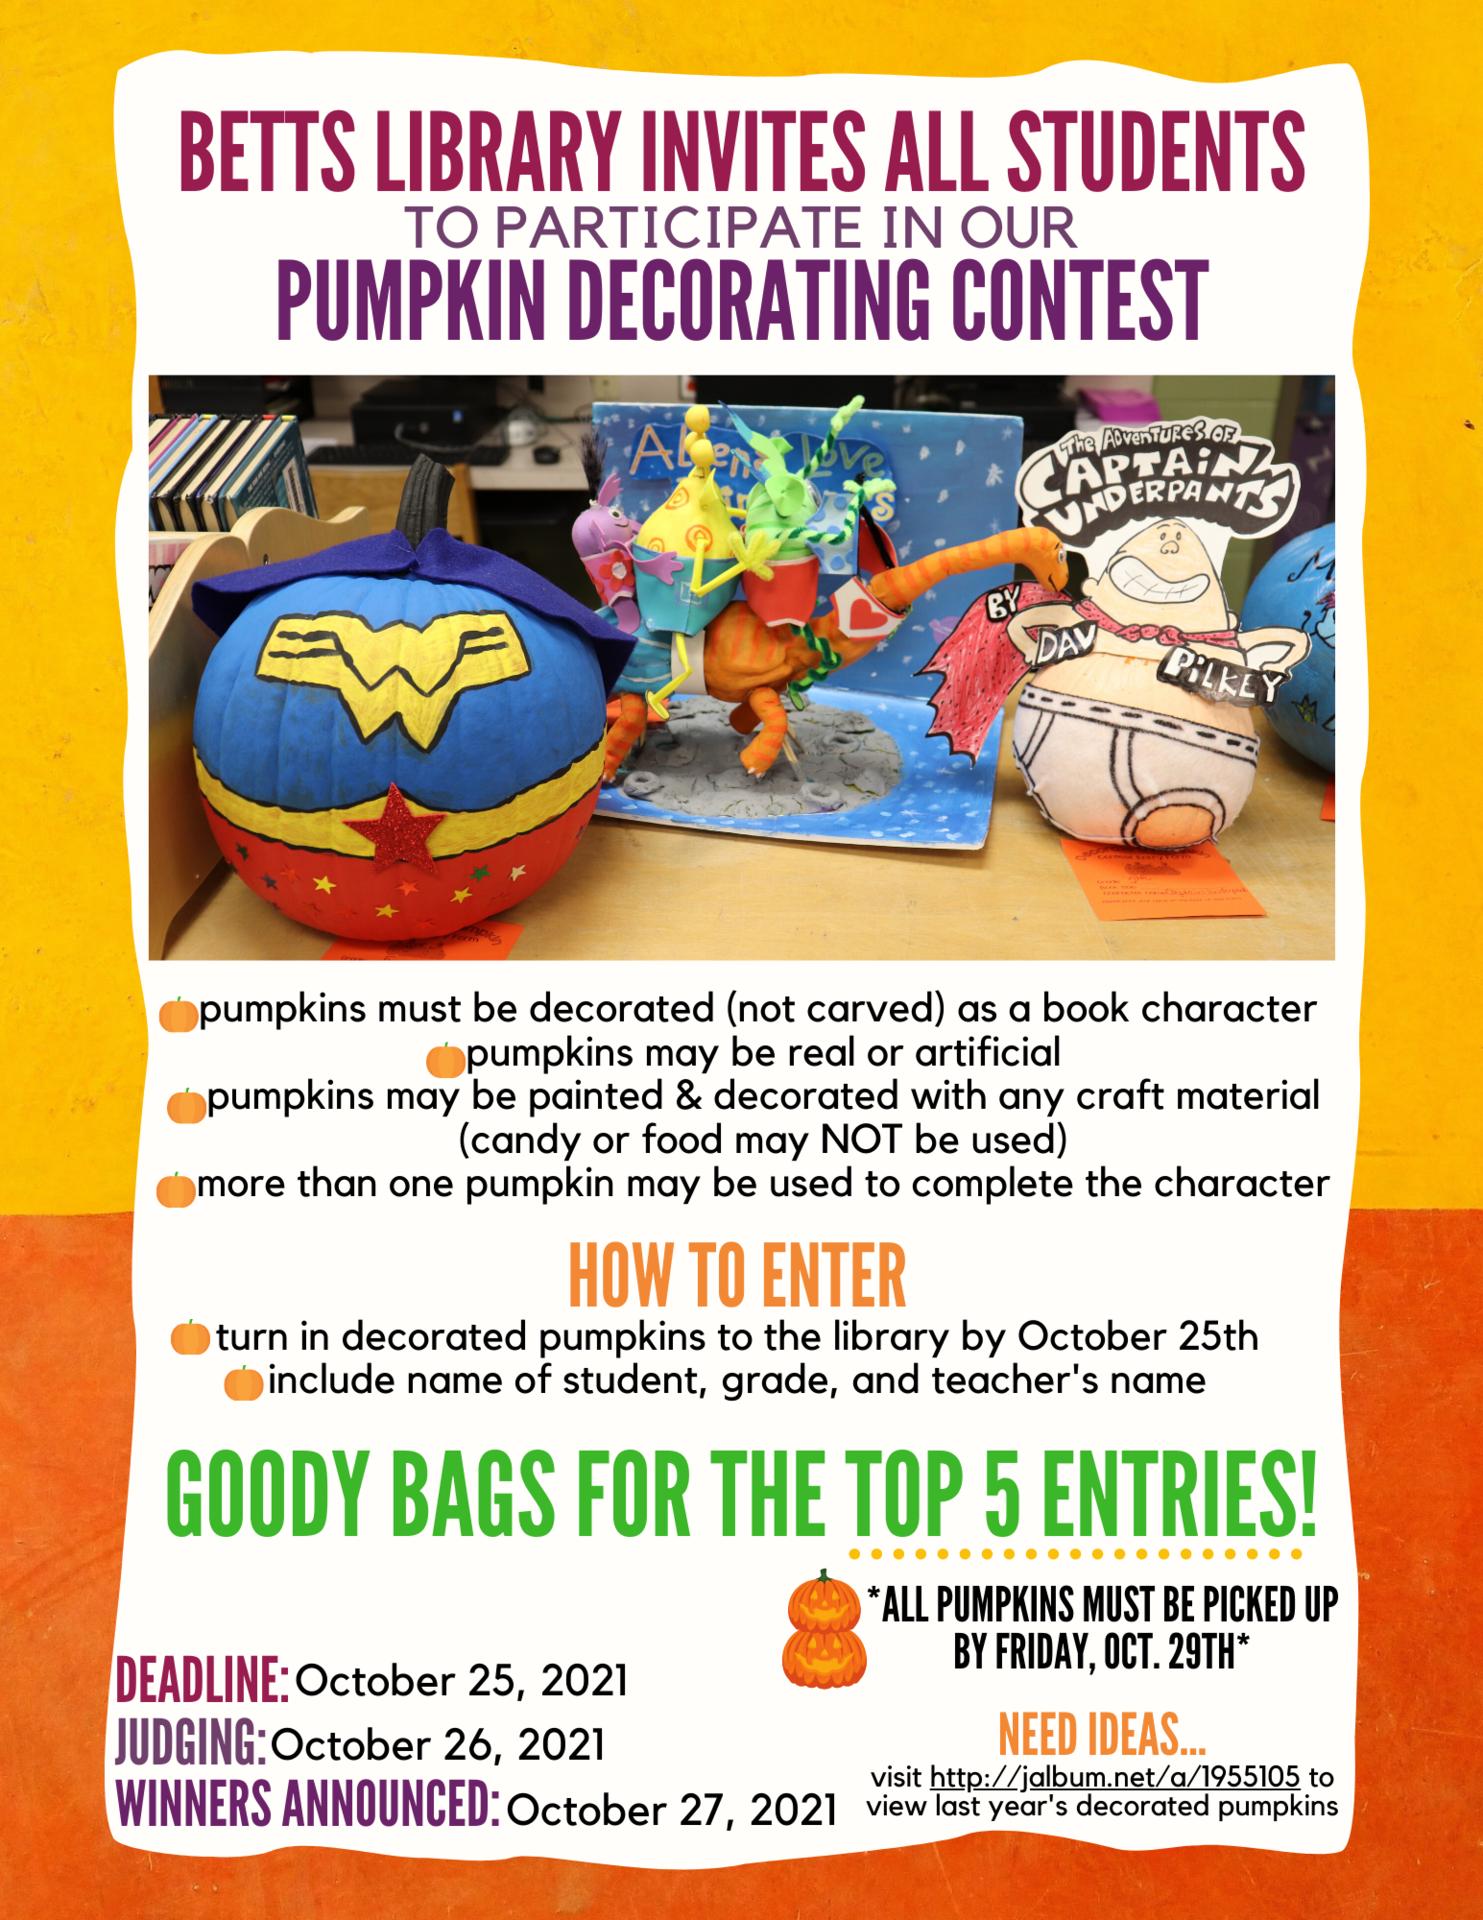 Image of pumpkin contest flyer